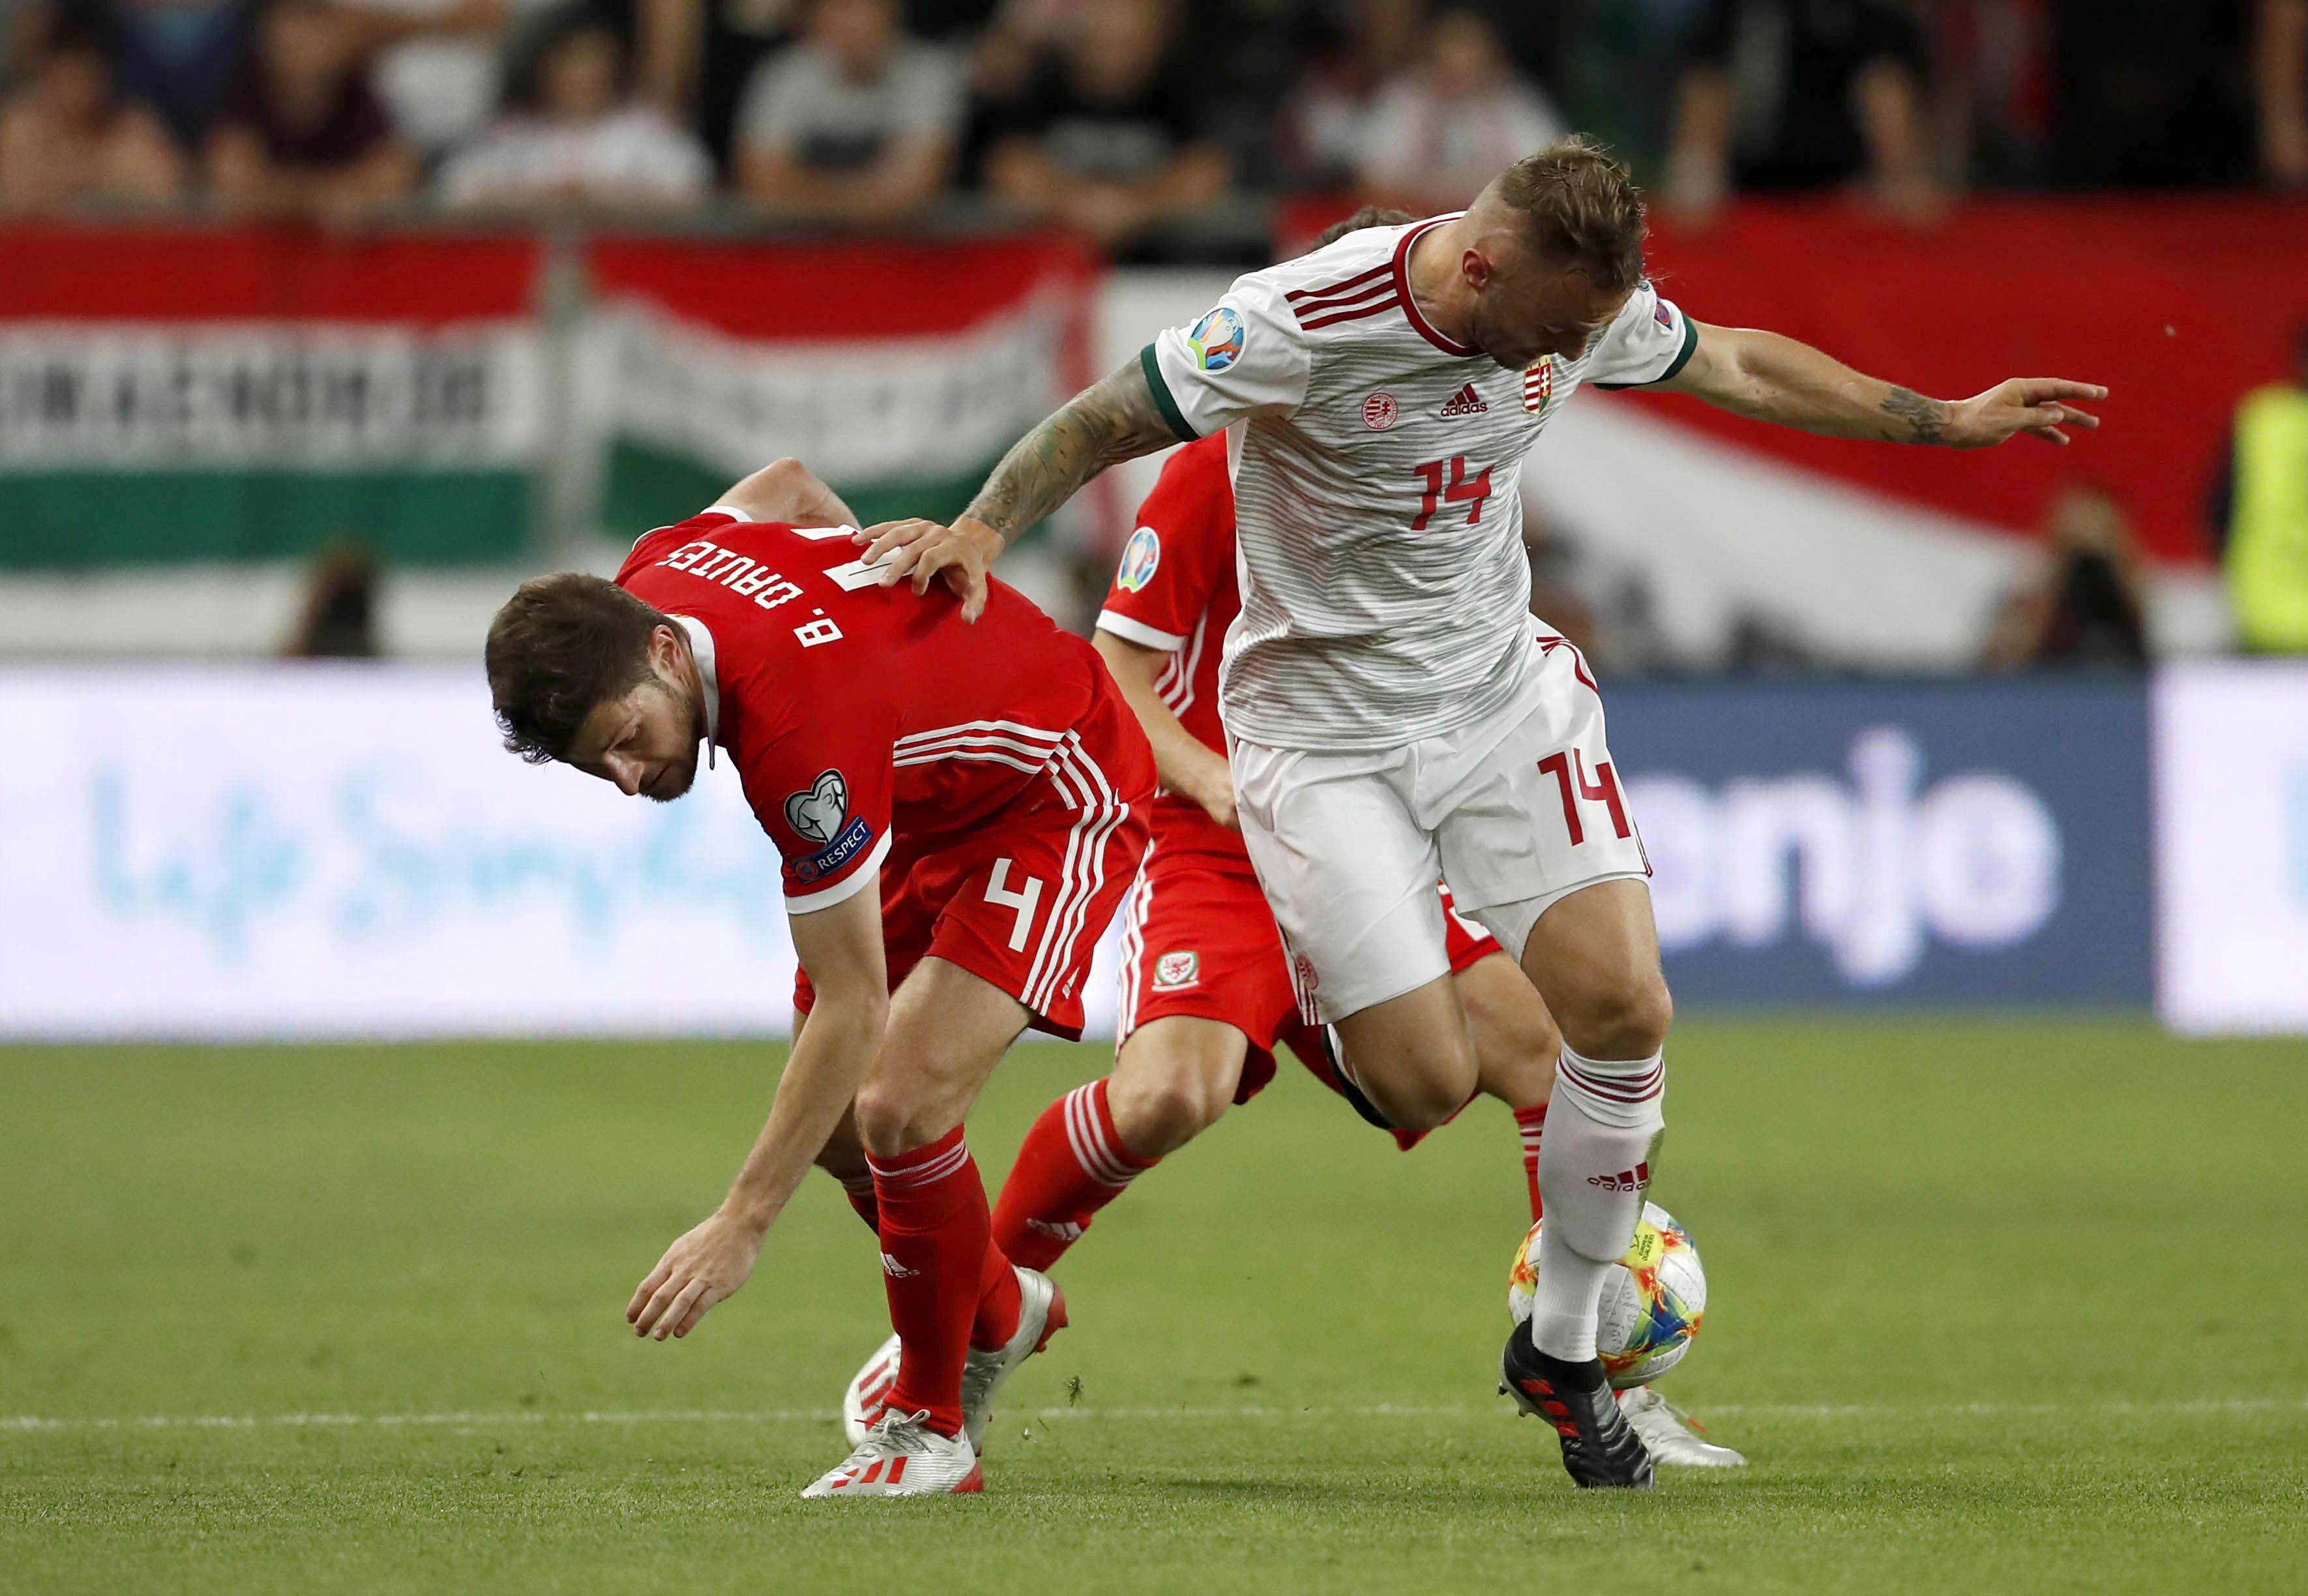 Tottenham's Ben Davies undergoes offseason groin surgery